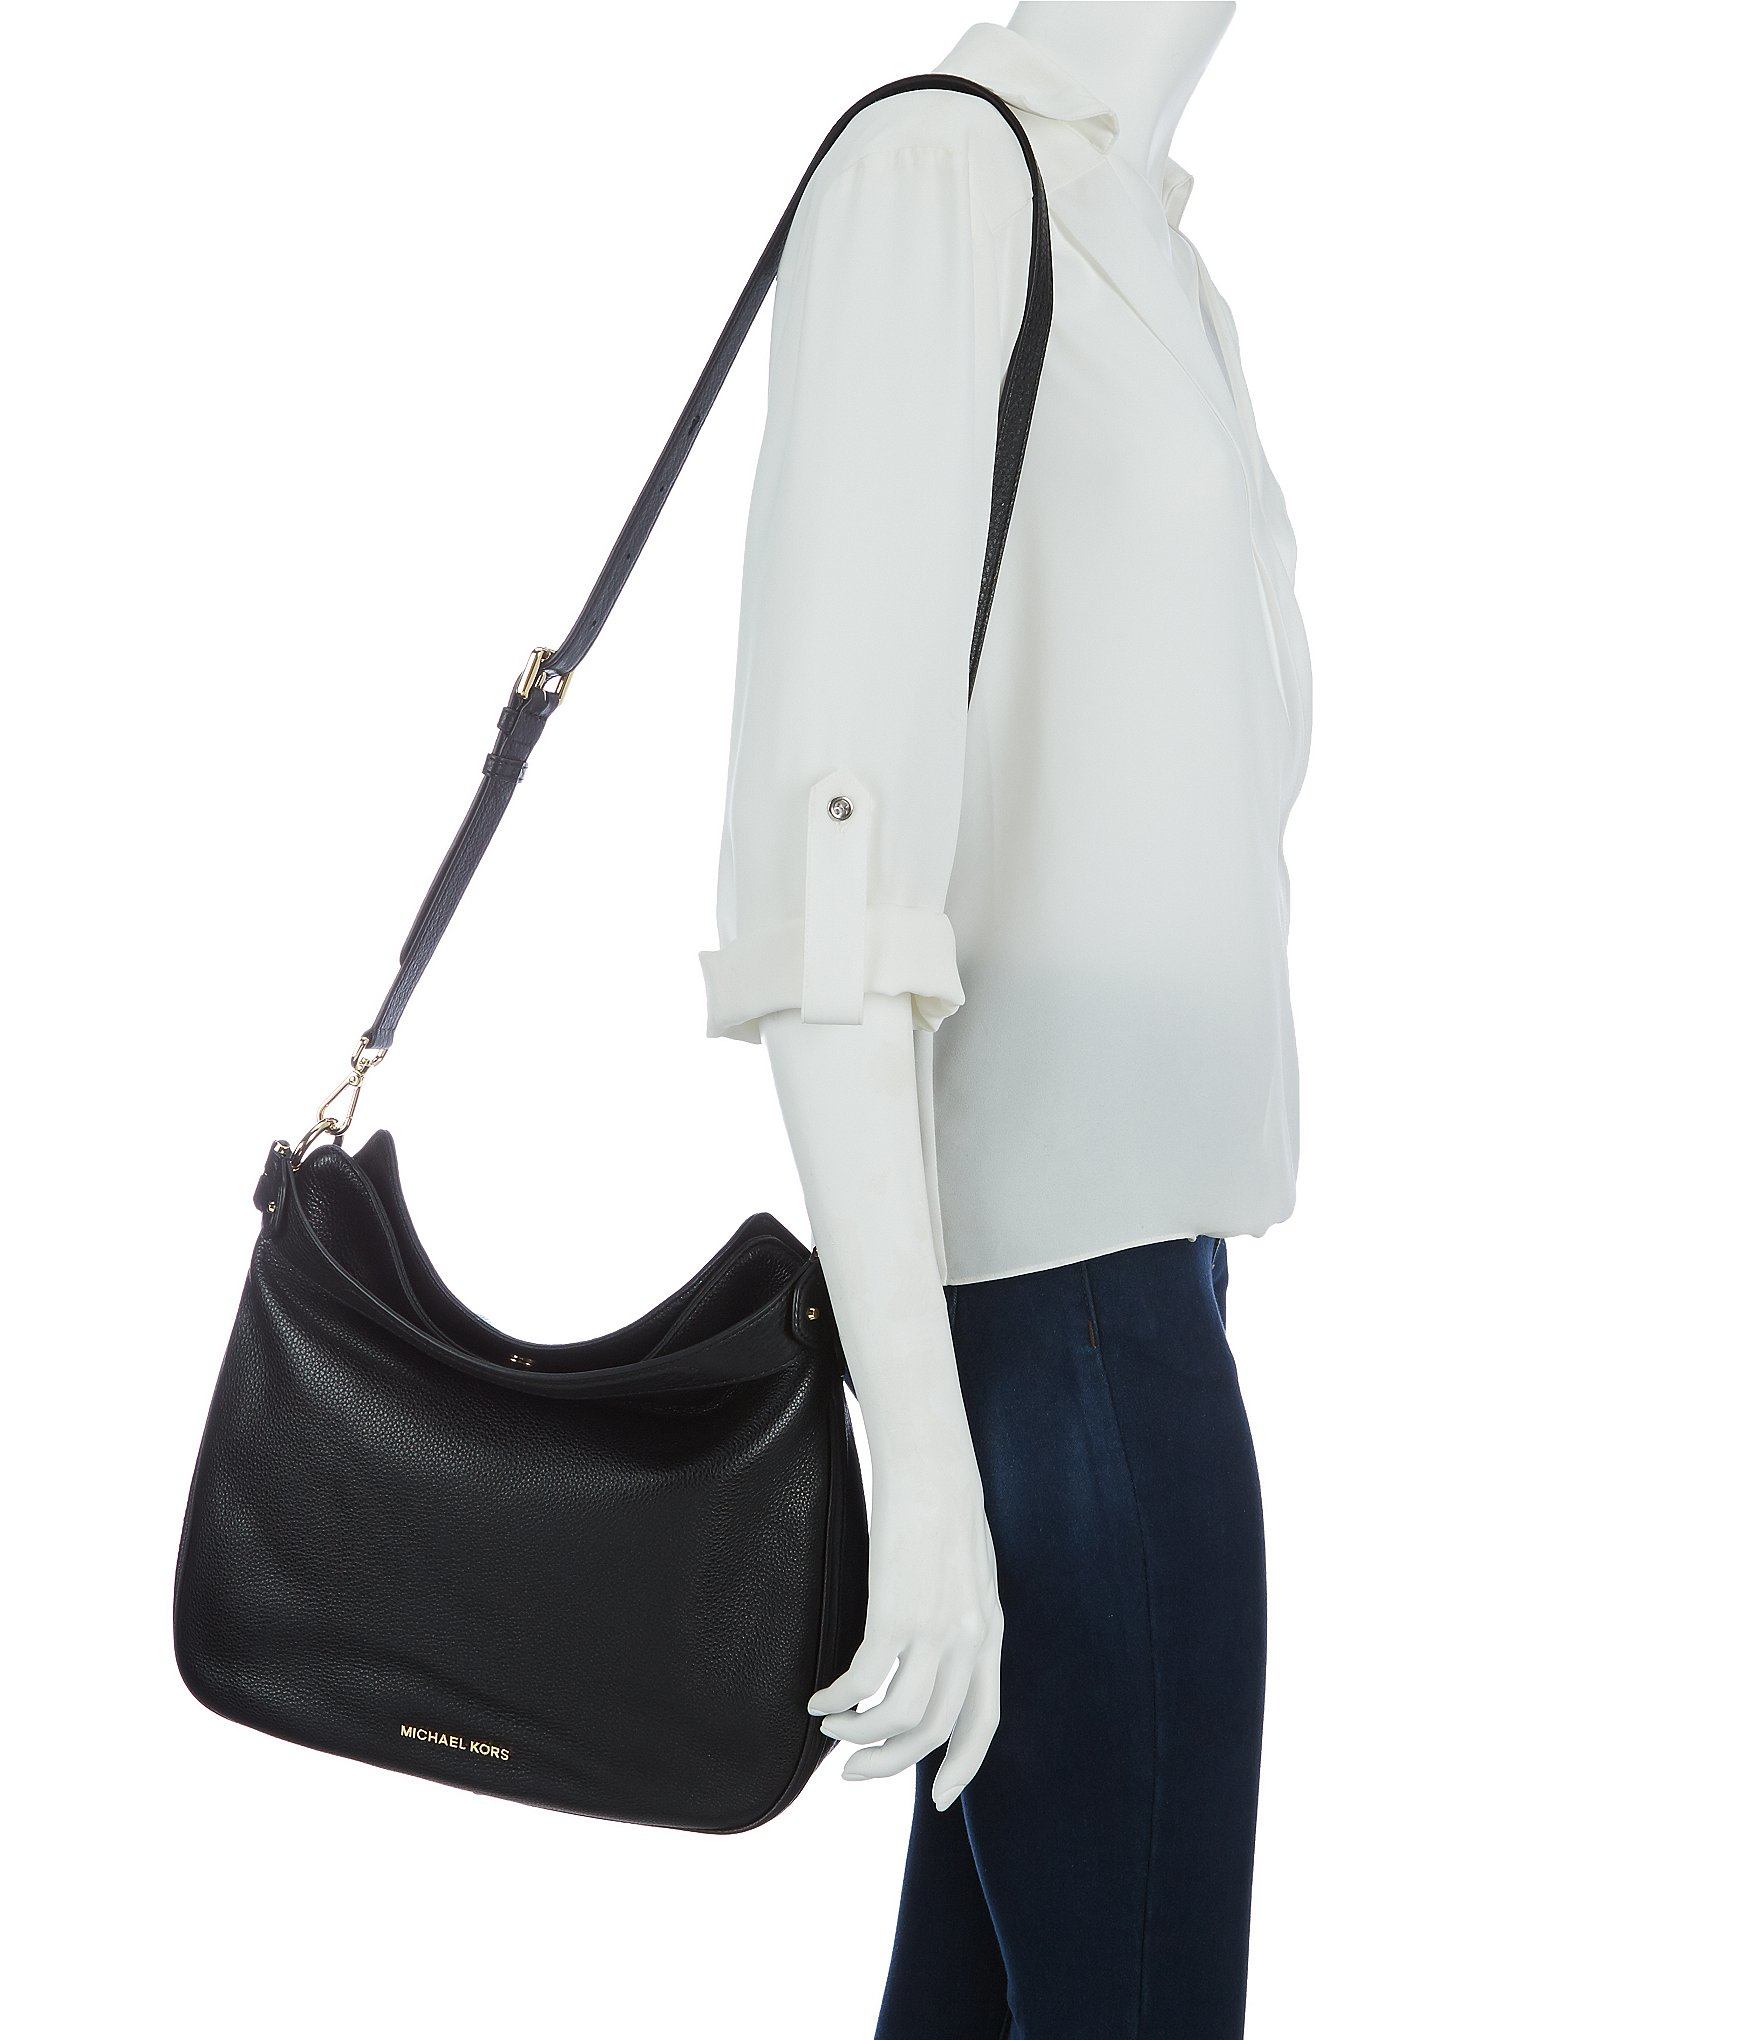 f491ee0cb5 Lyst - MICHAEL Michael Kors Heidi Medium Convertible Leather Hobo Bag in  Black